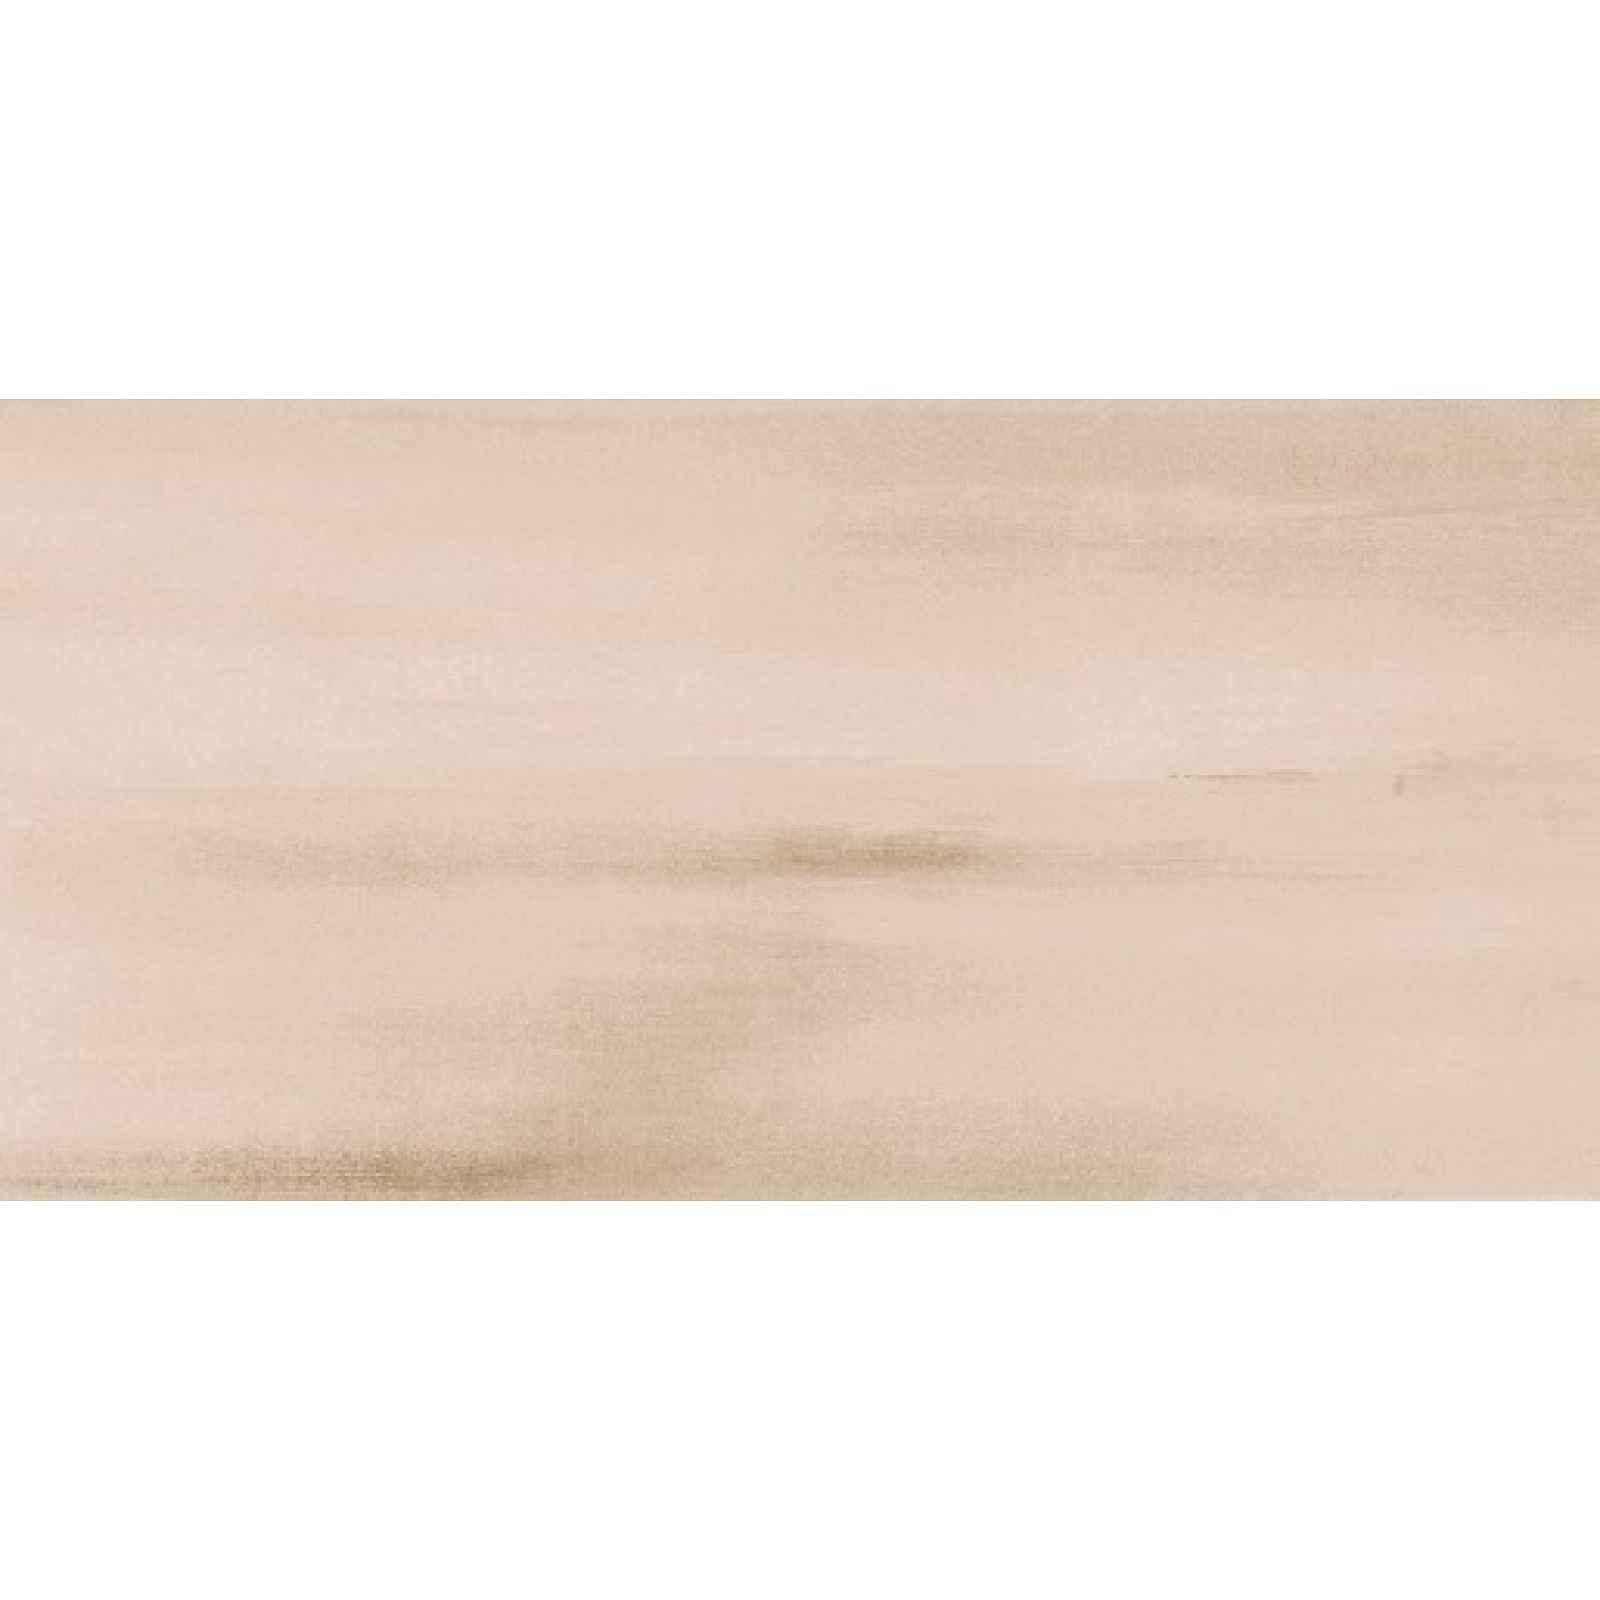 Obklad RAKO Poem béžová 30x60 cm lesk WADV4574.1